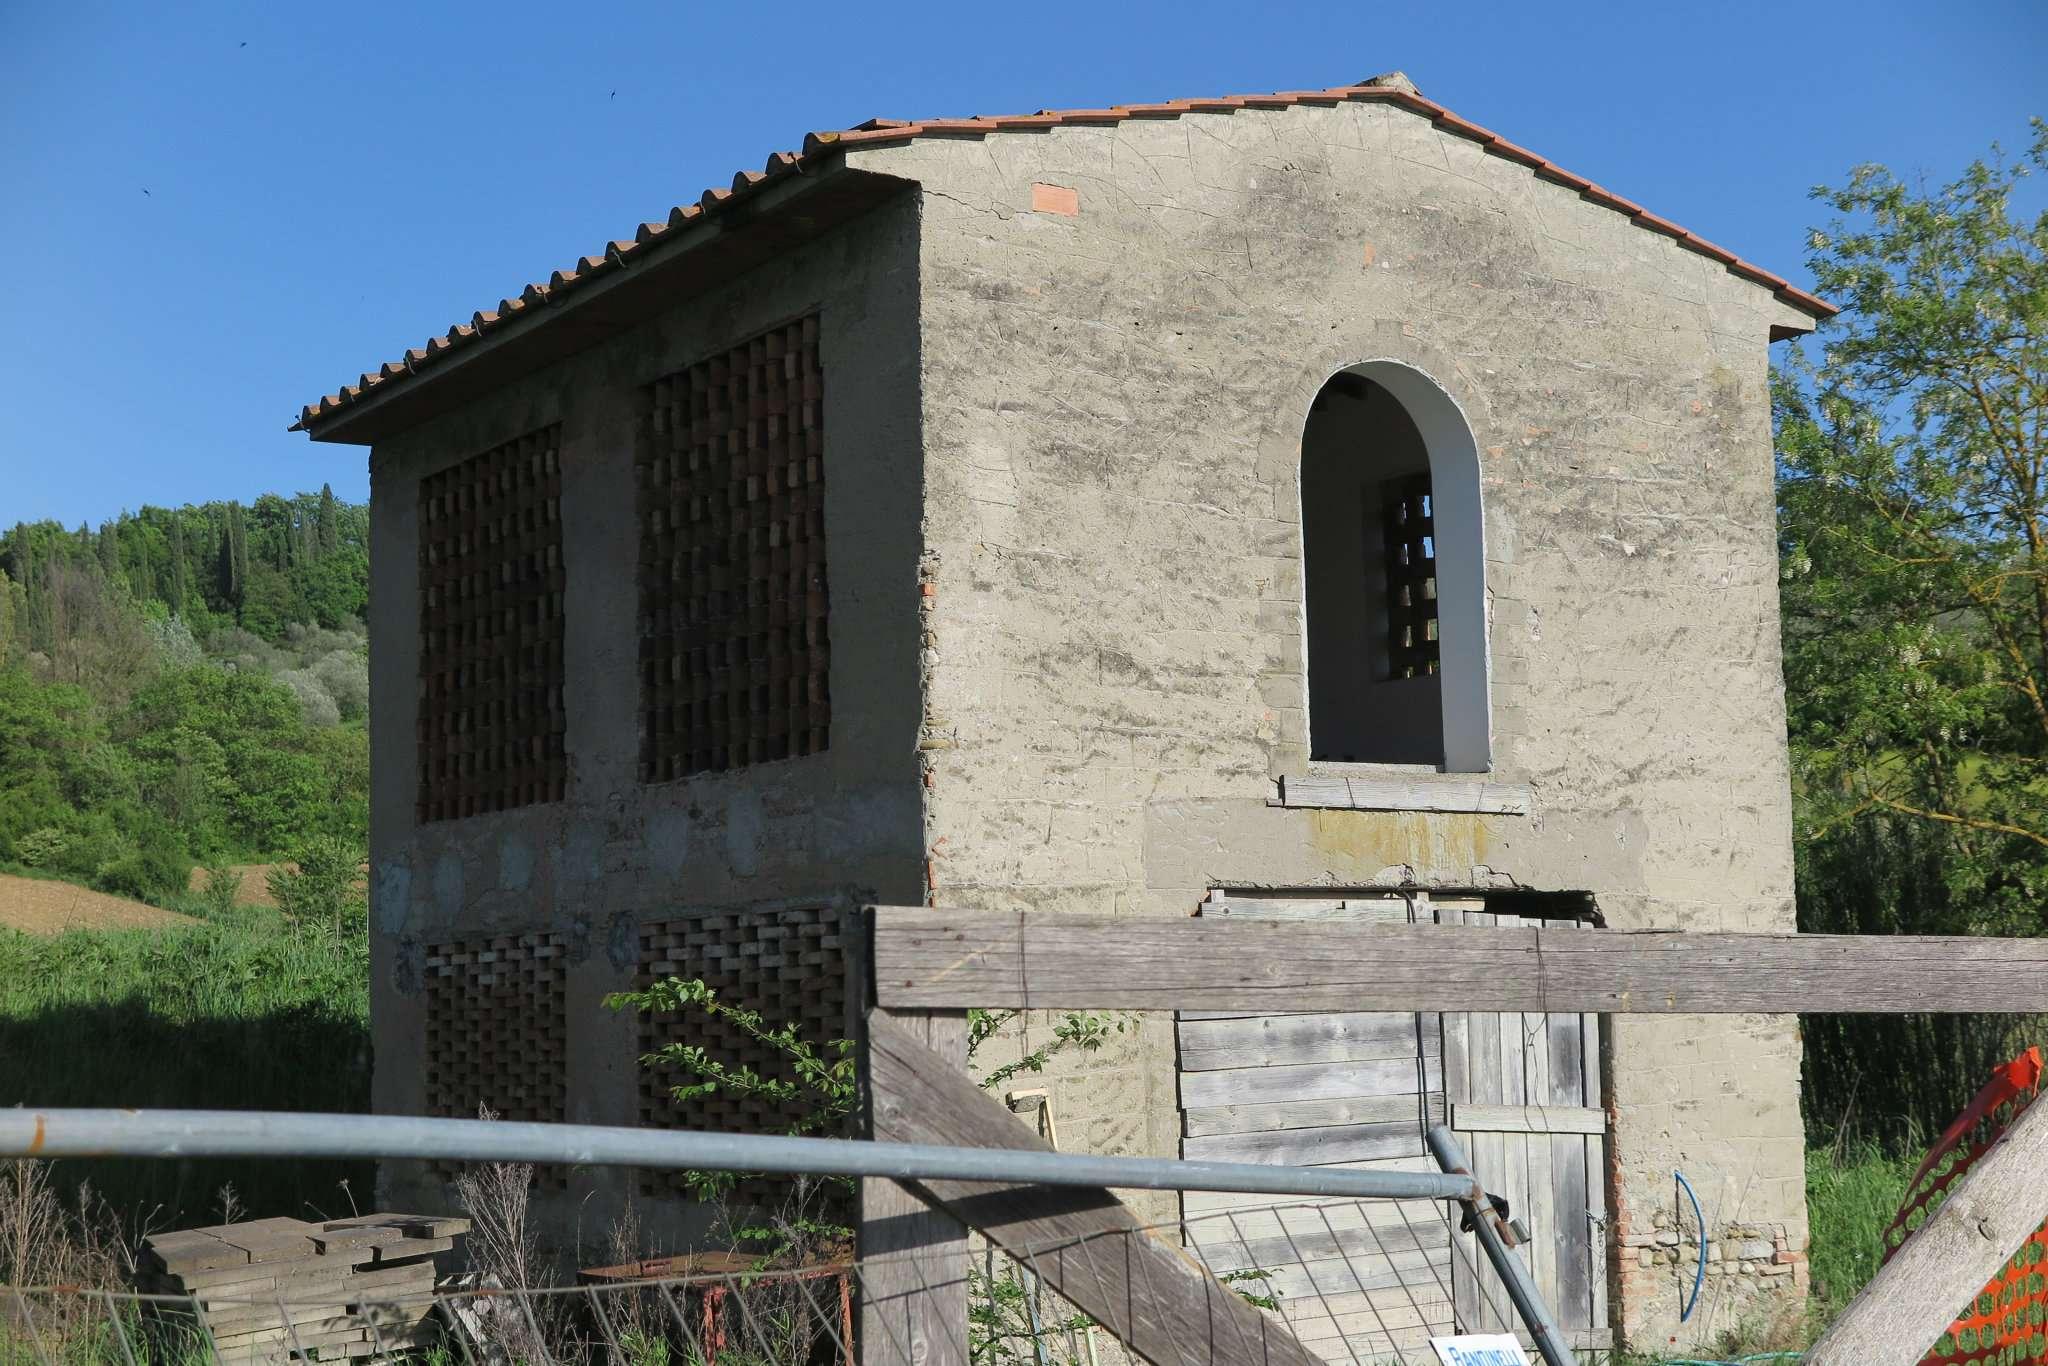 Bilocale San Casciano in Val di Pesa Via Empolese 8